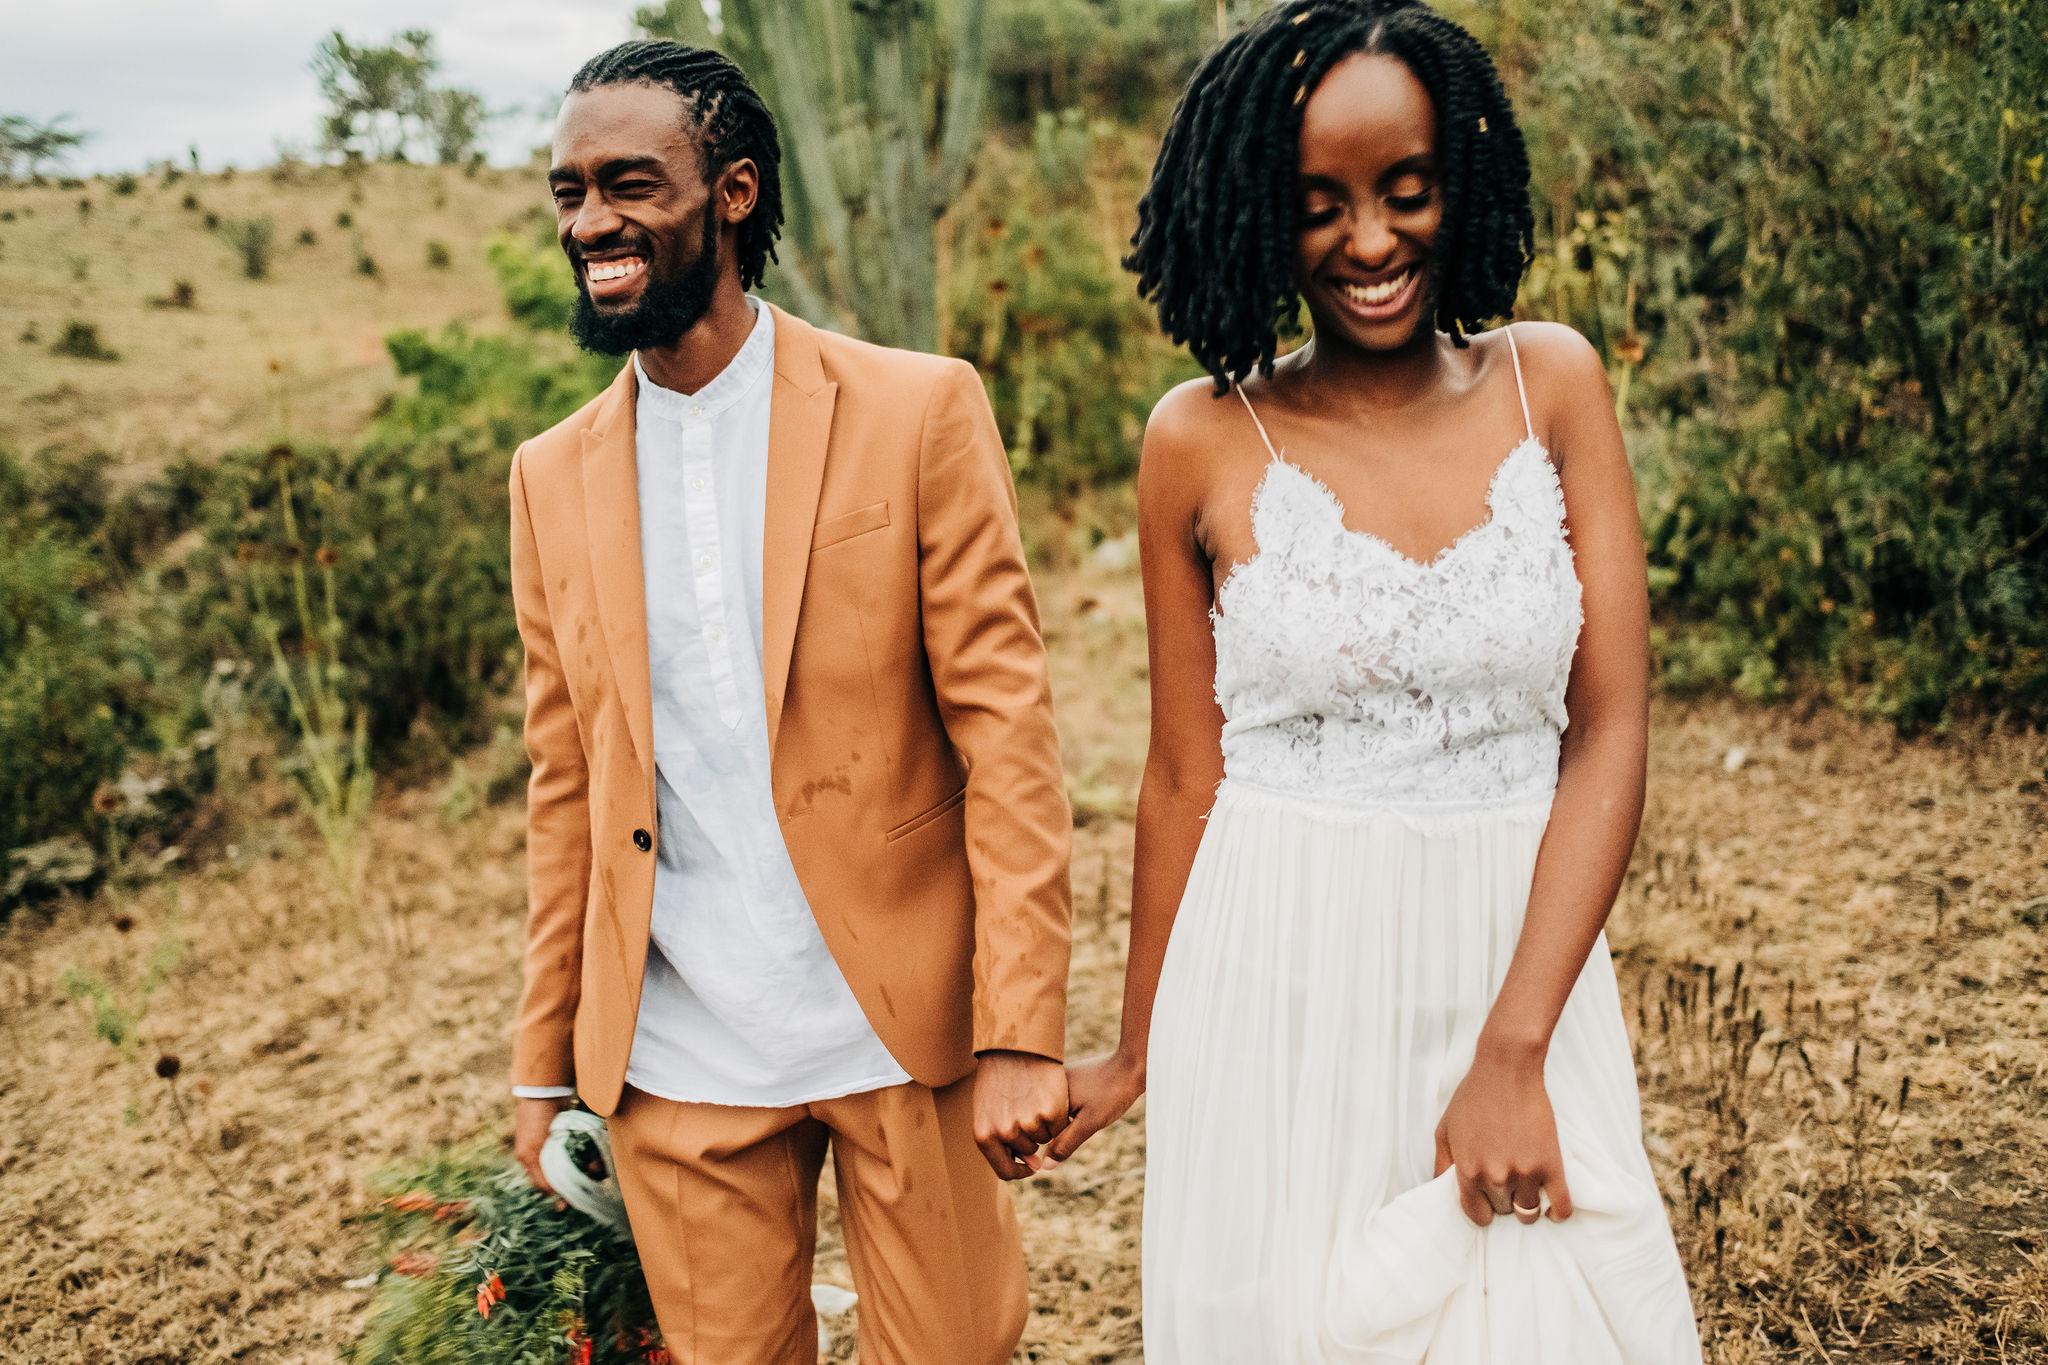 Anna-Hari-Photography-Destination-Wedding-Photographer-Kenya-244.jpg